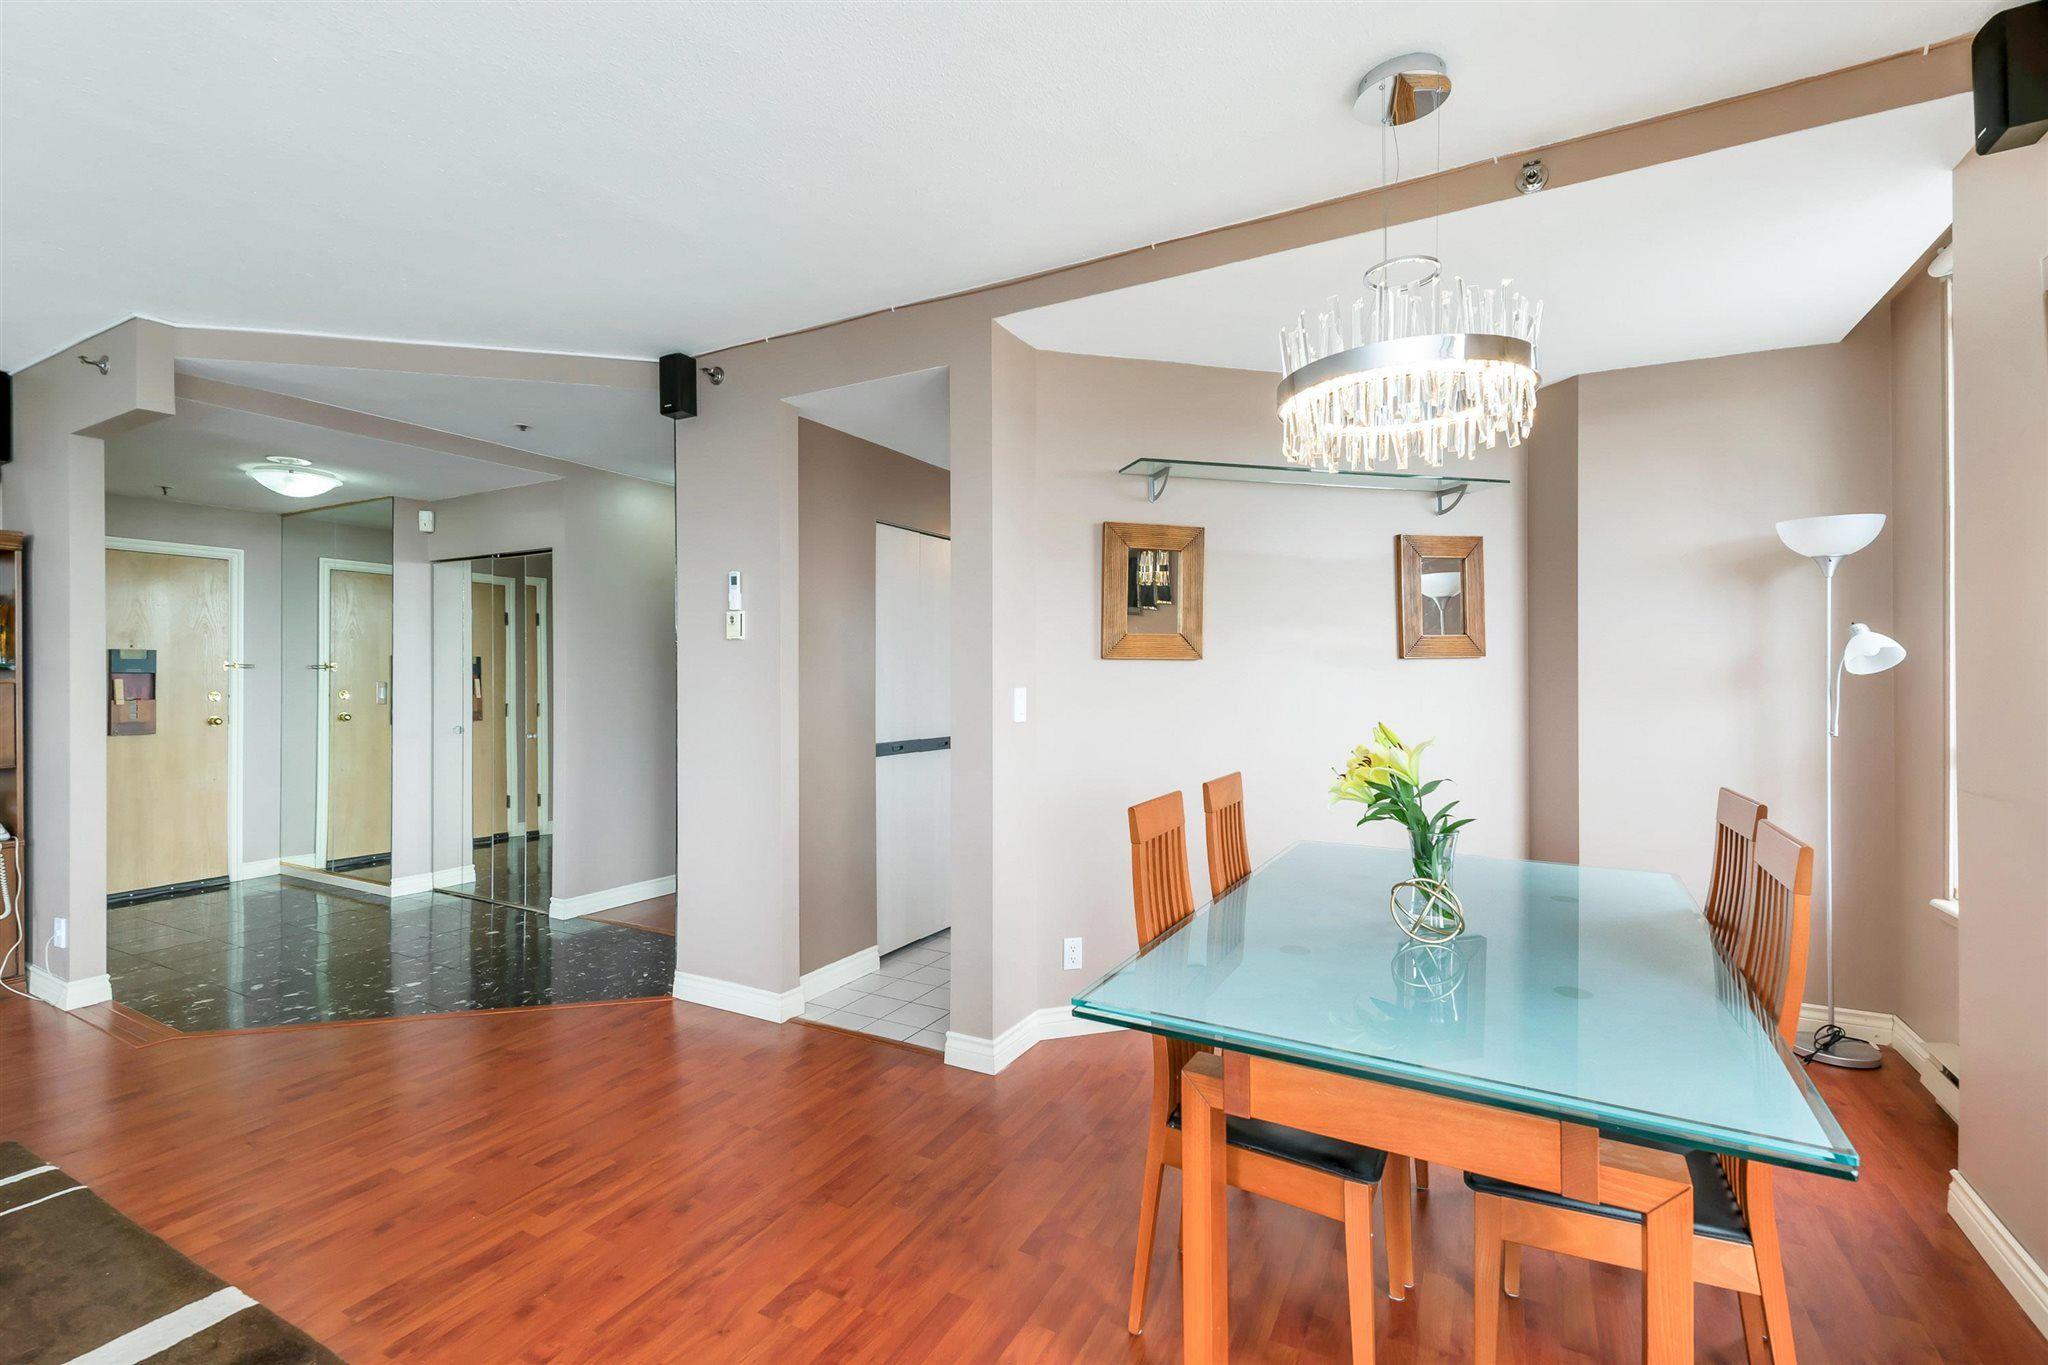 "Photo 7: Photos: 1401 728 FARROW Street in Coquitlam: Coquitlam West Condo for sale in ""THE VICTORIA"" : MLS®# R2615321"